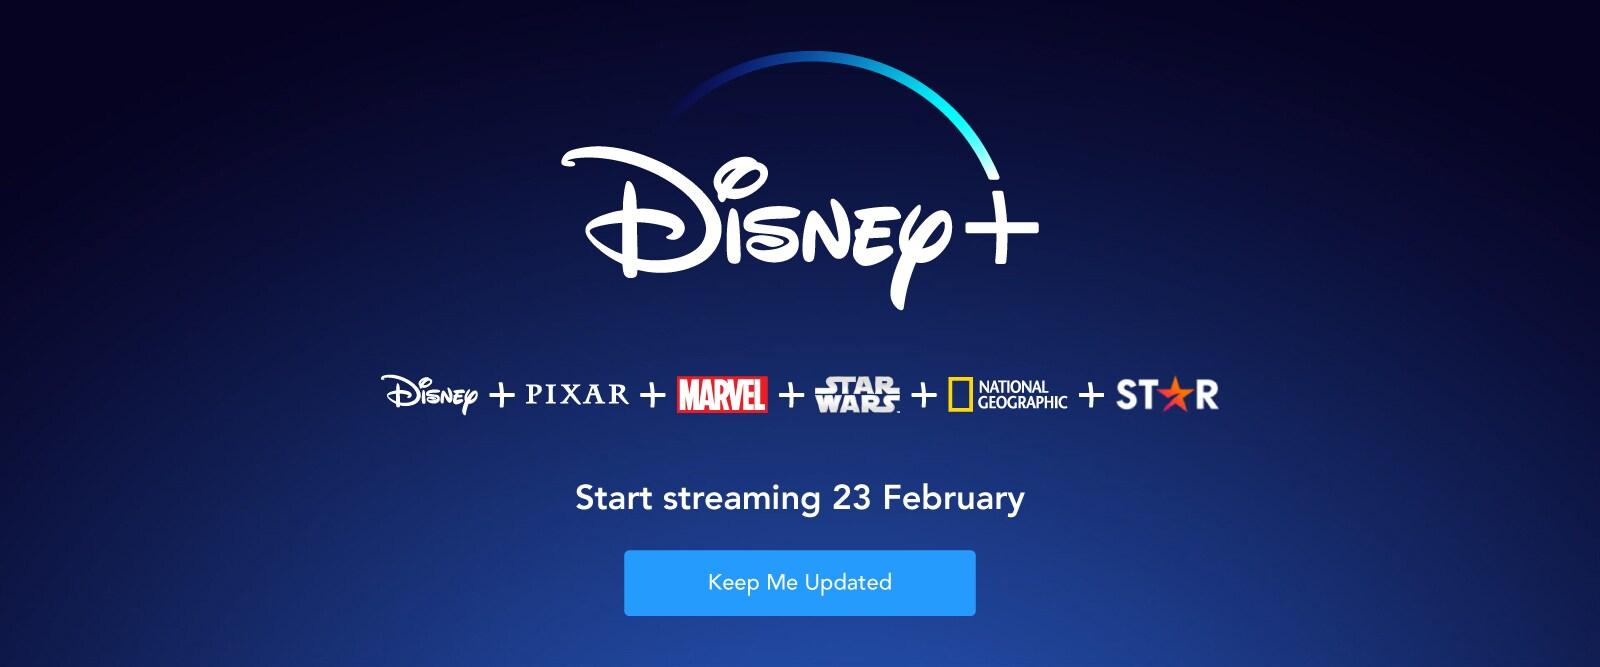 Disney+ Singapore Launch EMEA Banner